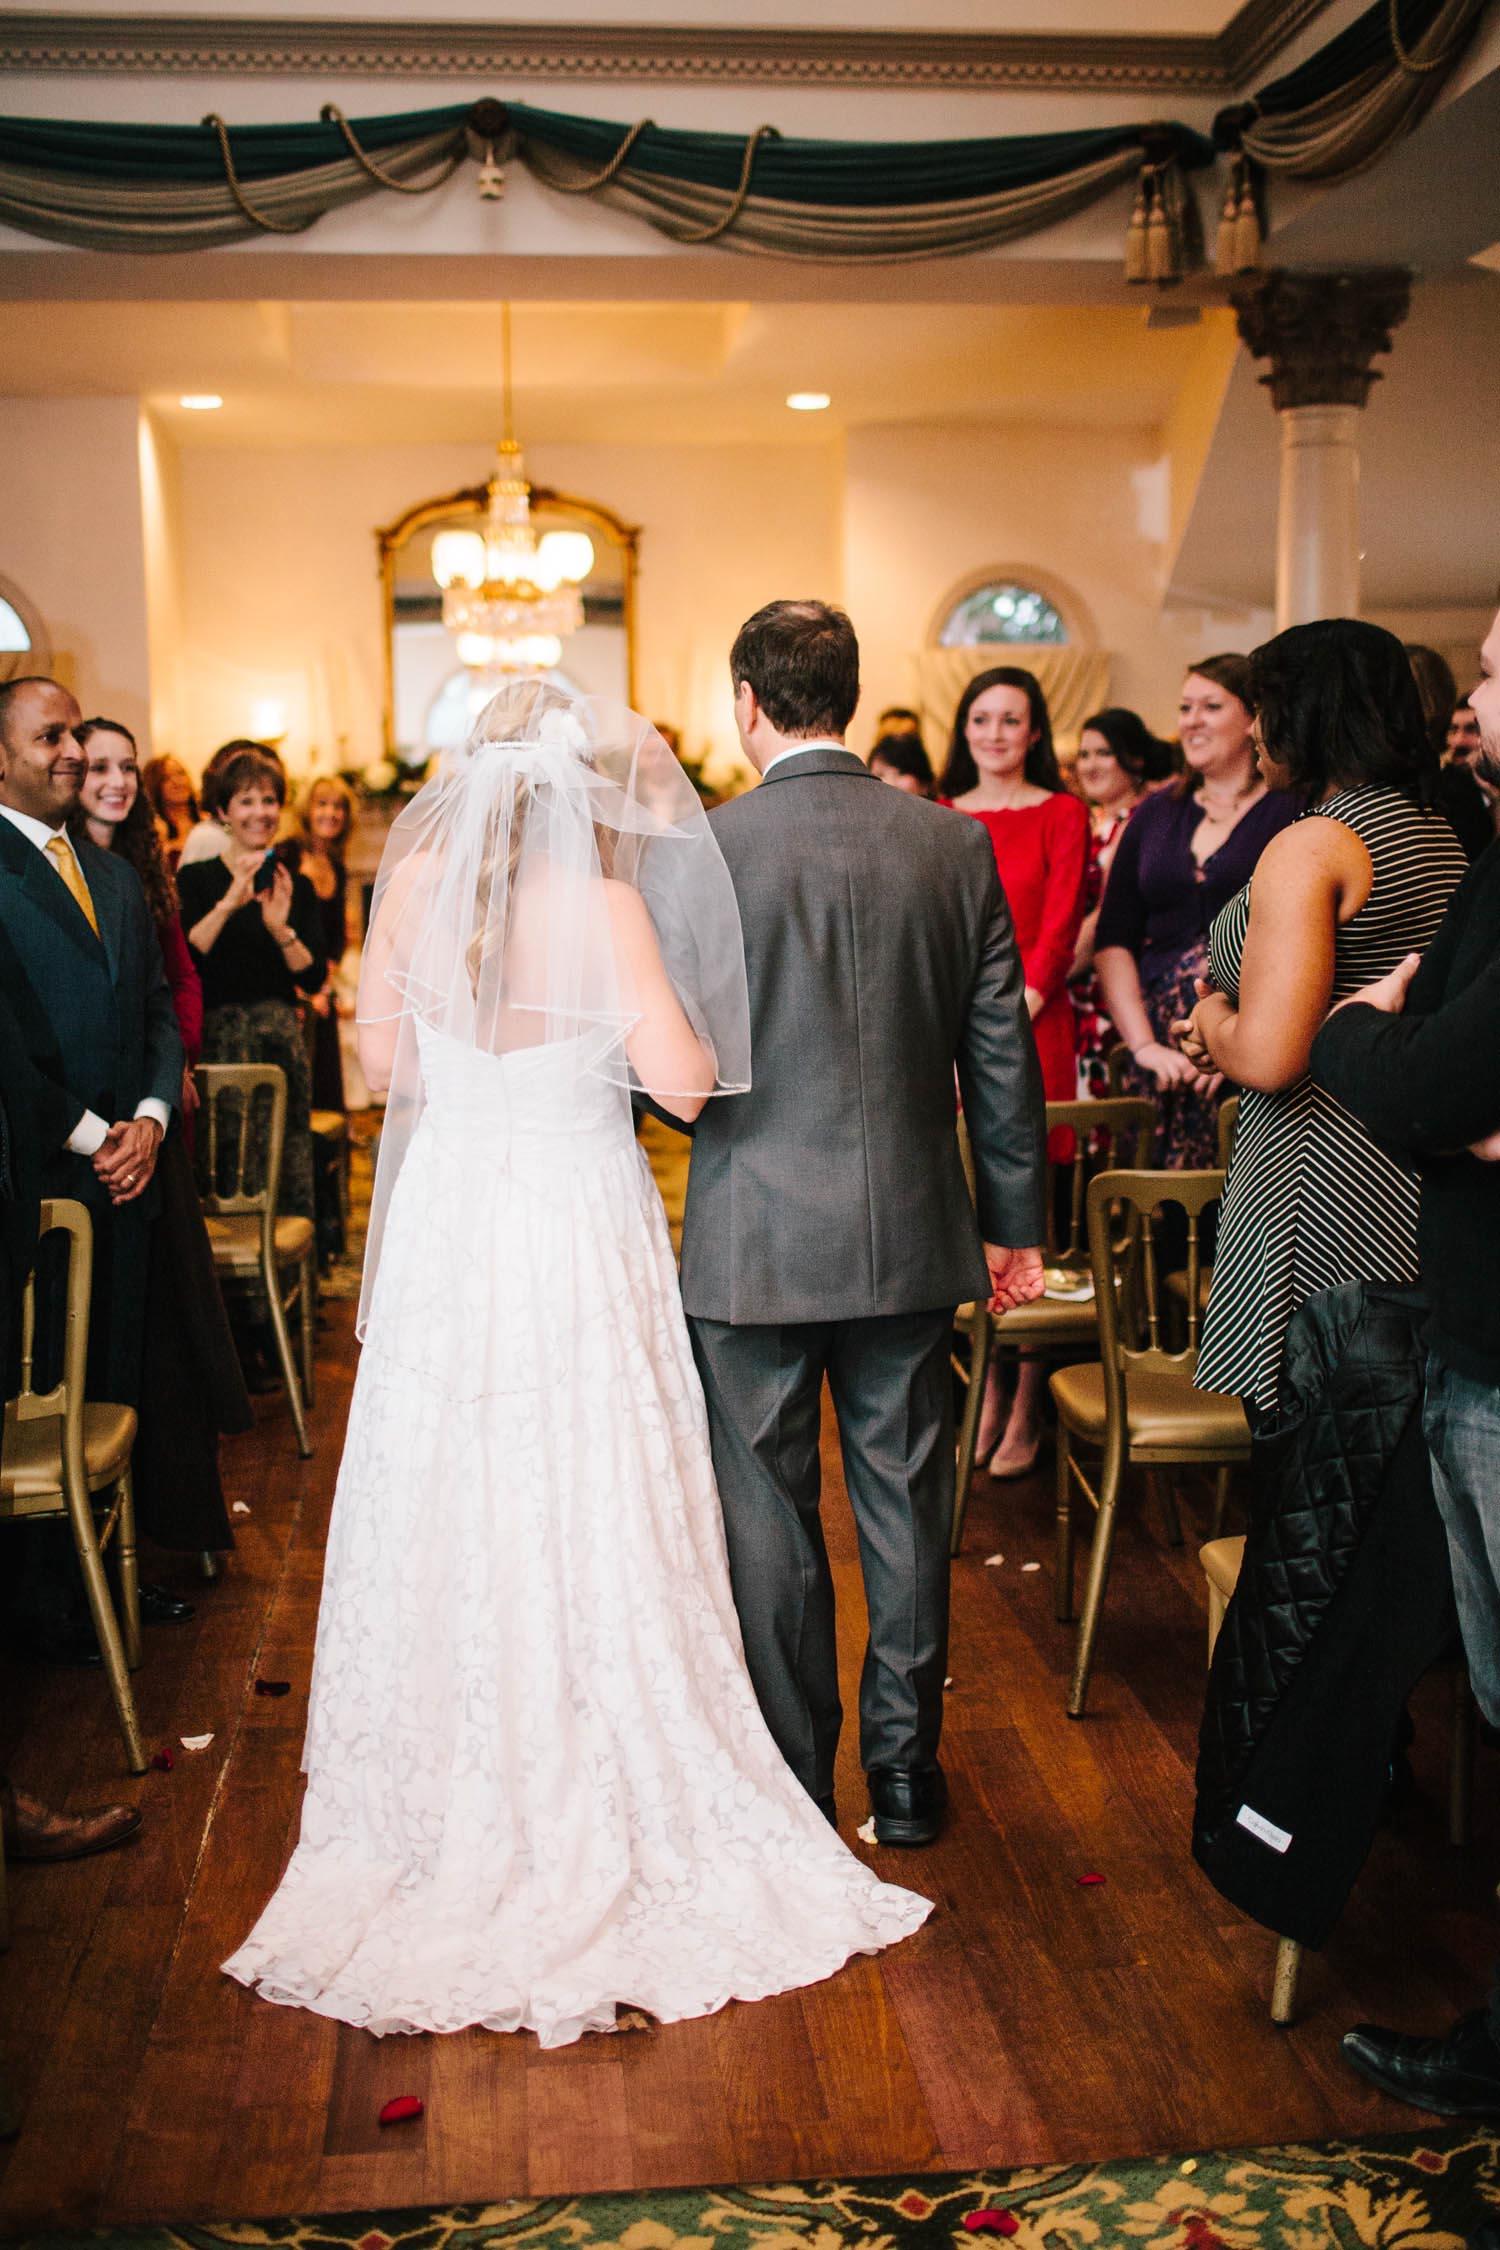 youngstrom-wedding-109.jpg